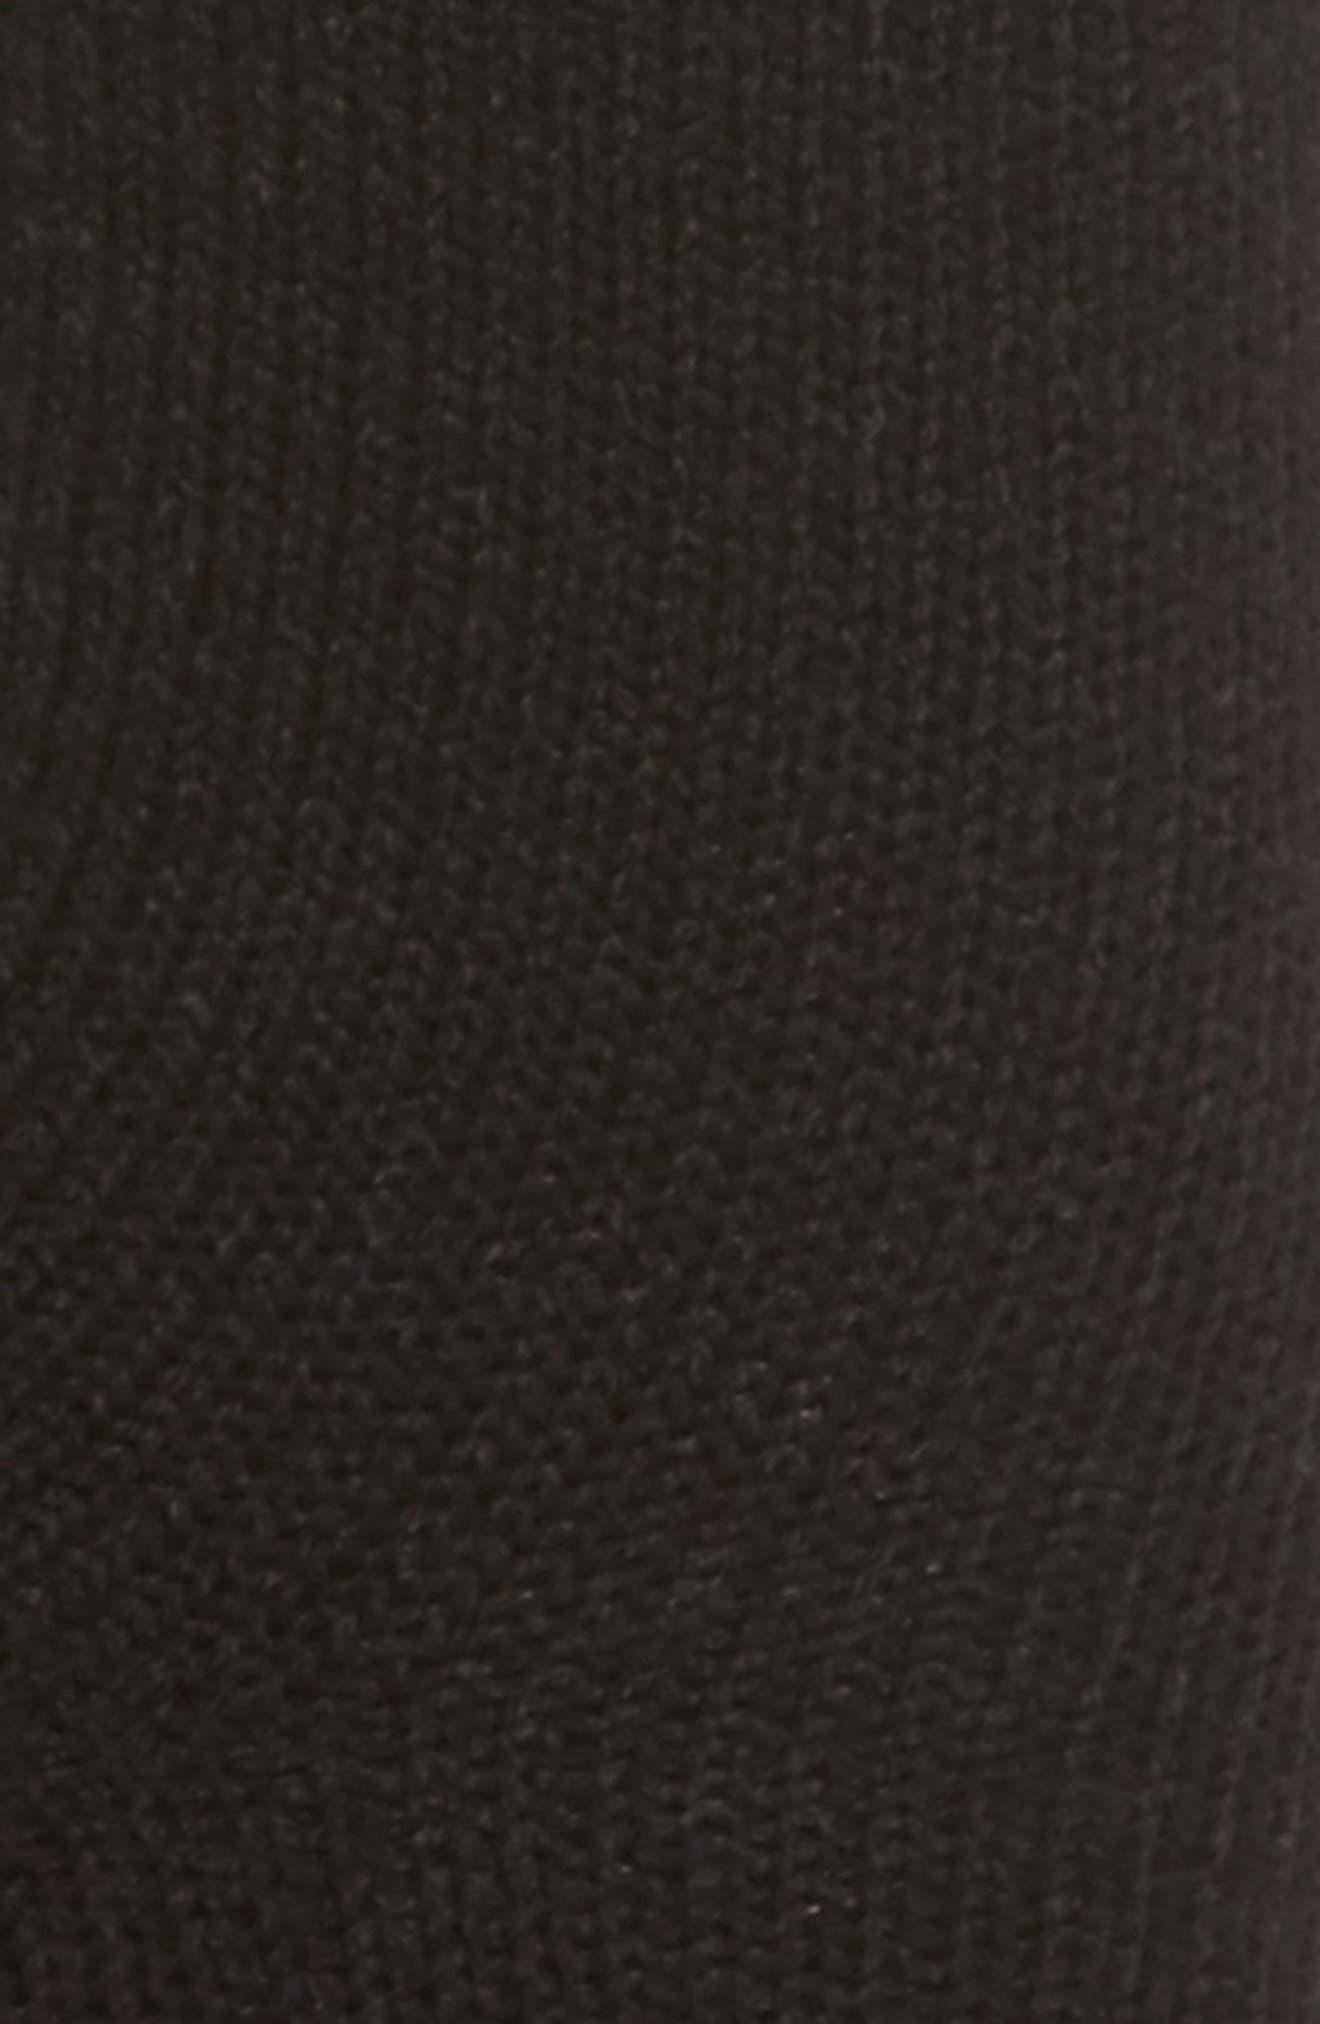 Butter Cuff Socks,                             Alternate thumbnail 2, color,                             Black